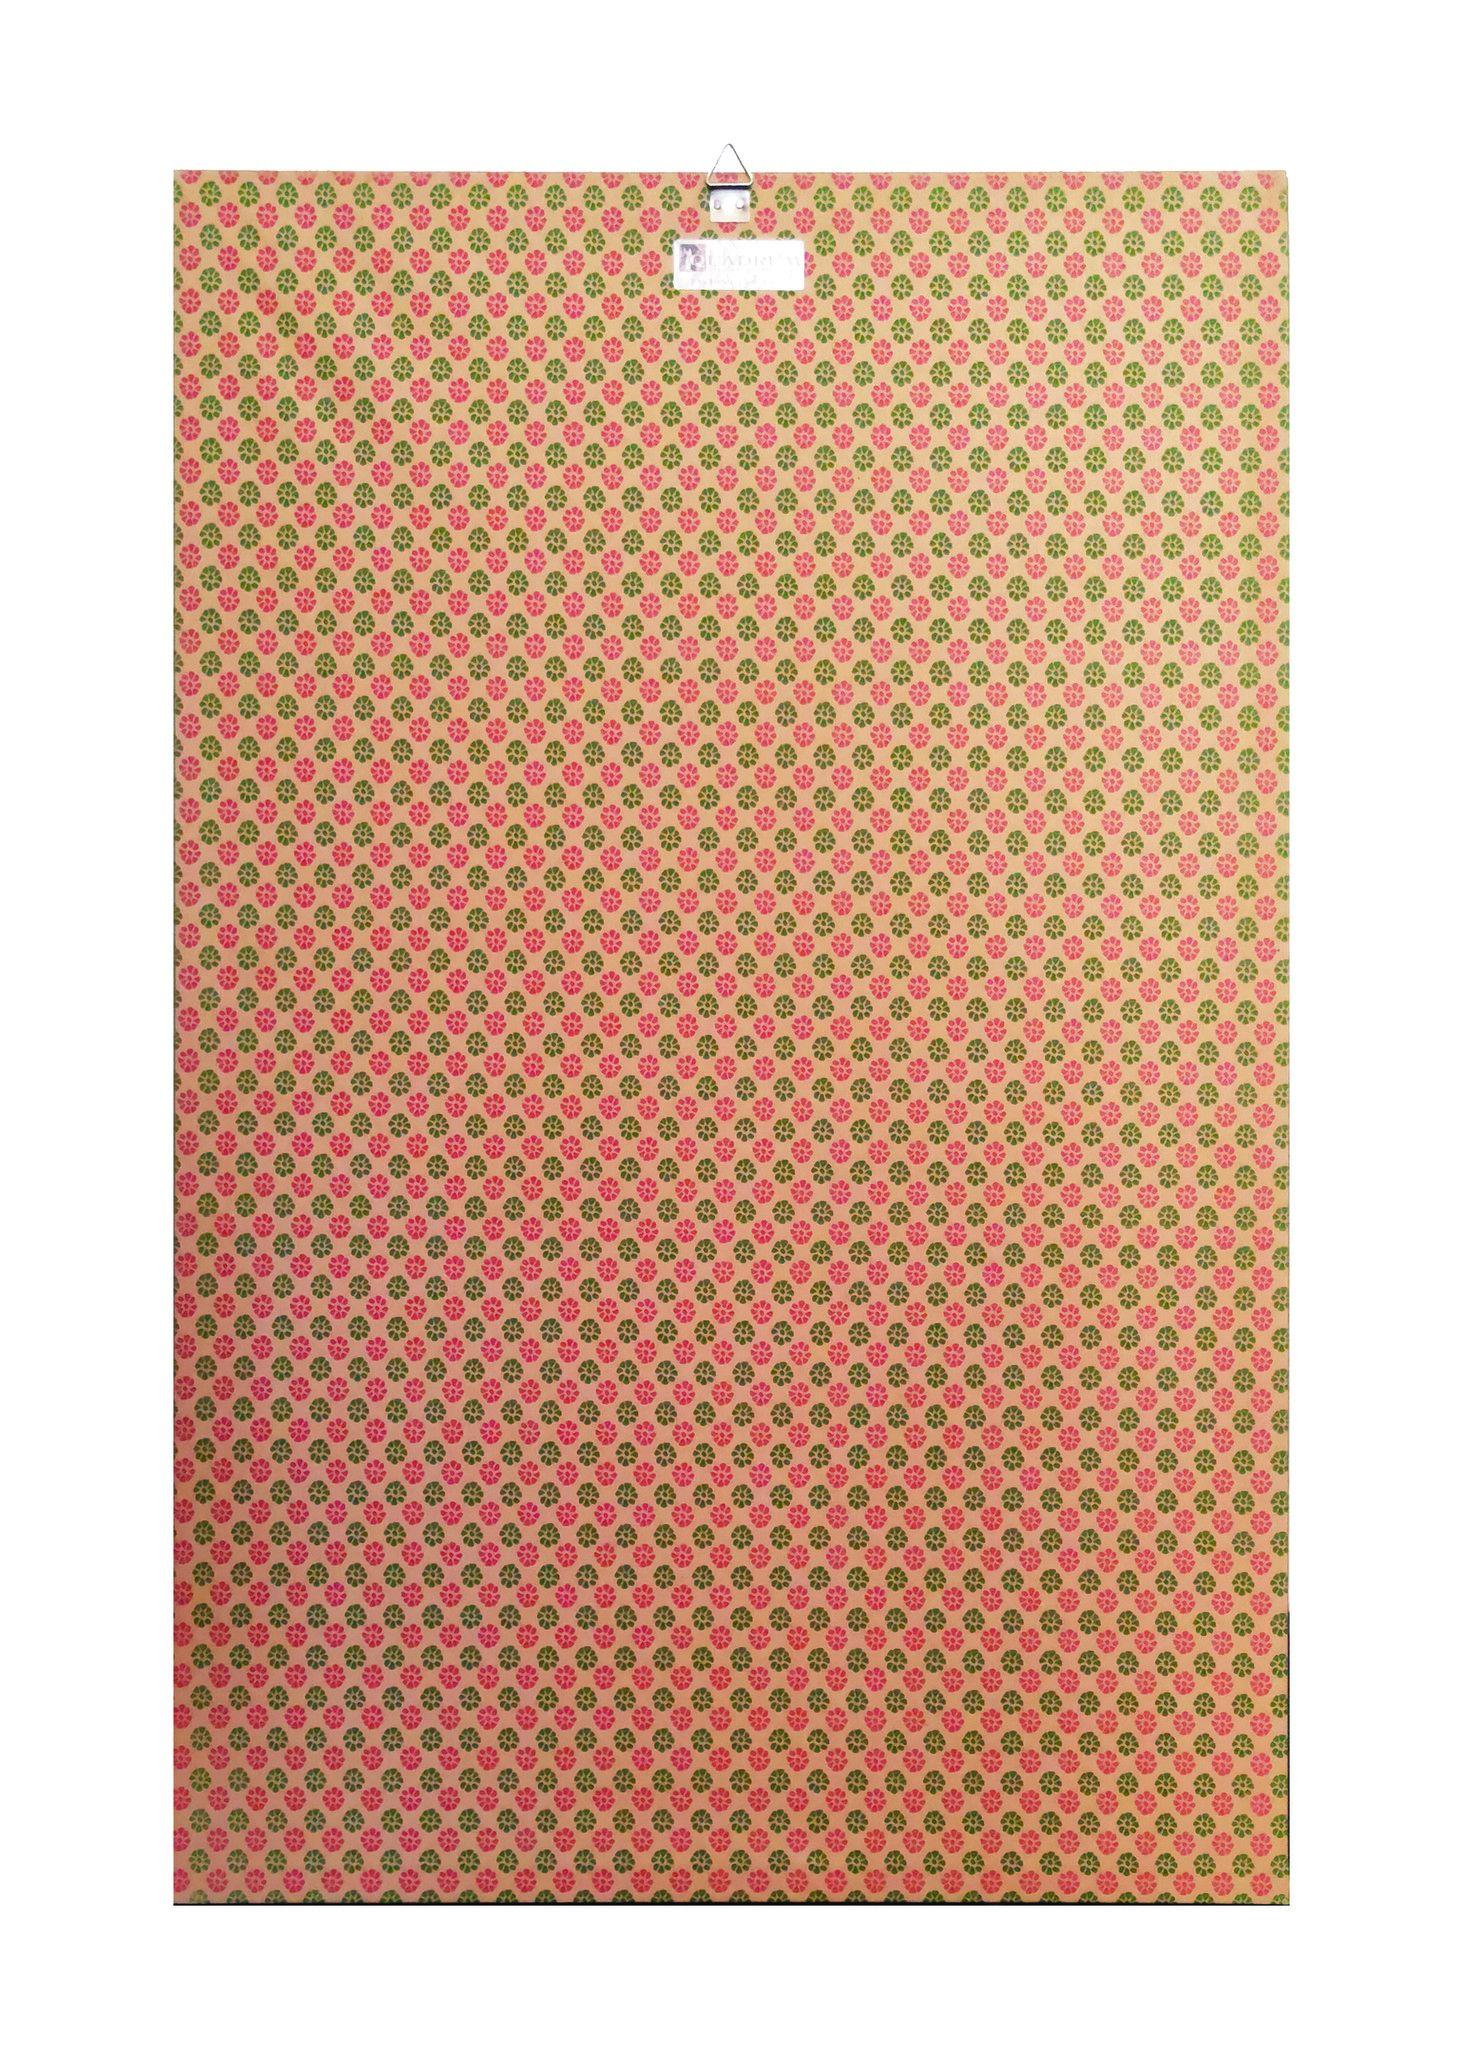 ACQUERELLO SU CARTA  VIVIAN  NARDUZZI ' GEISHA BLU 2 '  dimensioni L 35 x H 54 cm.